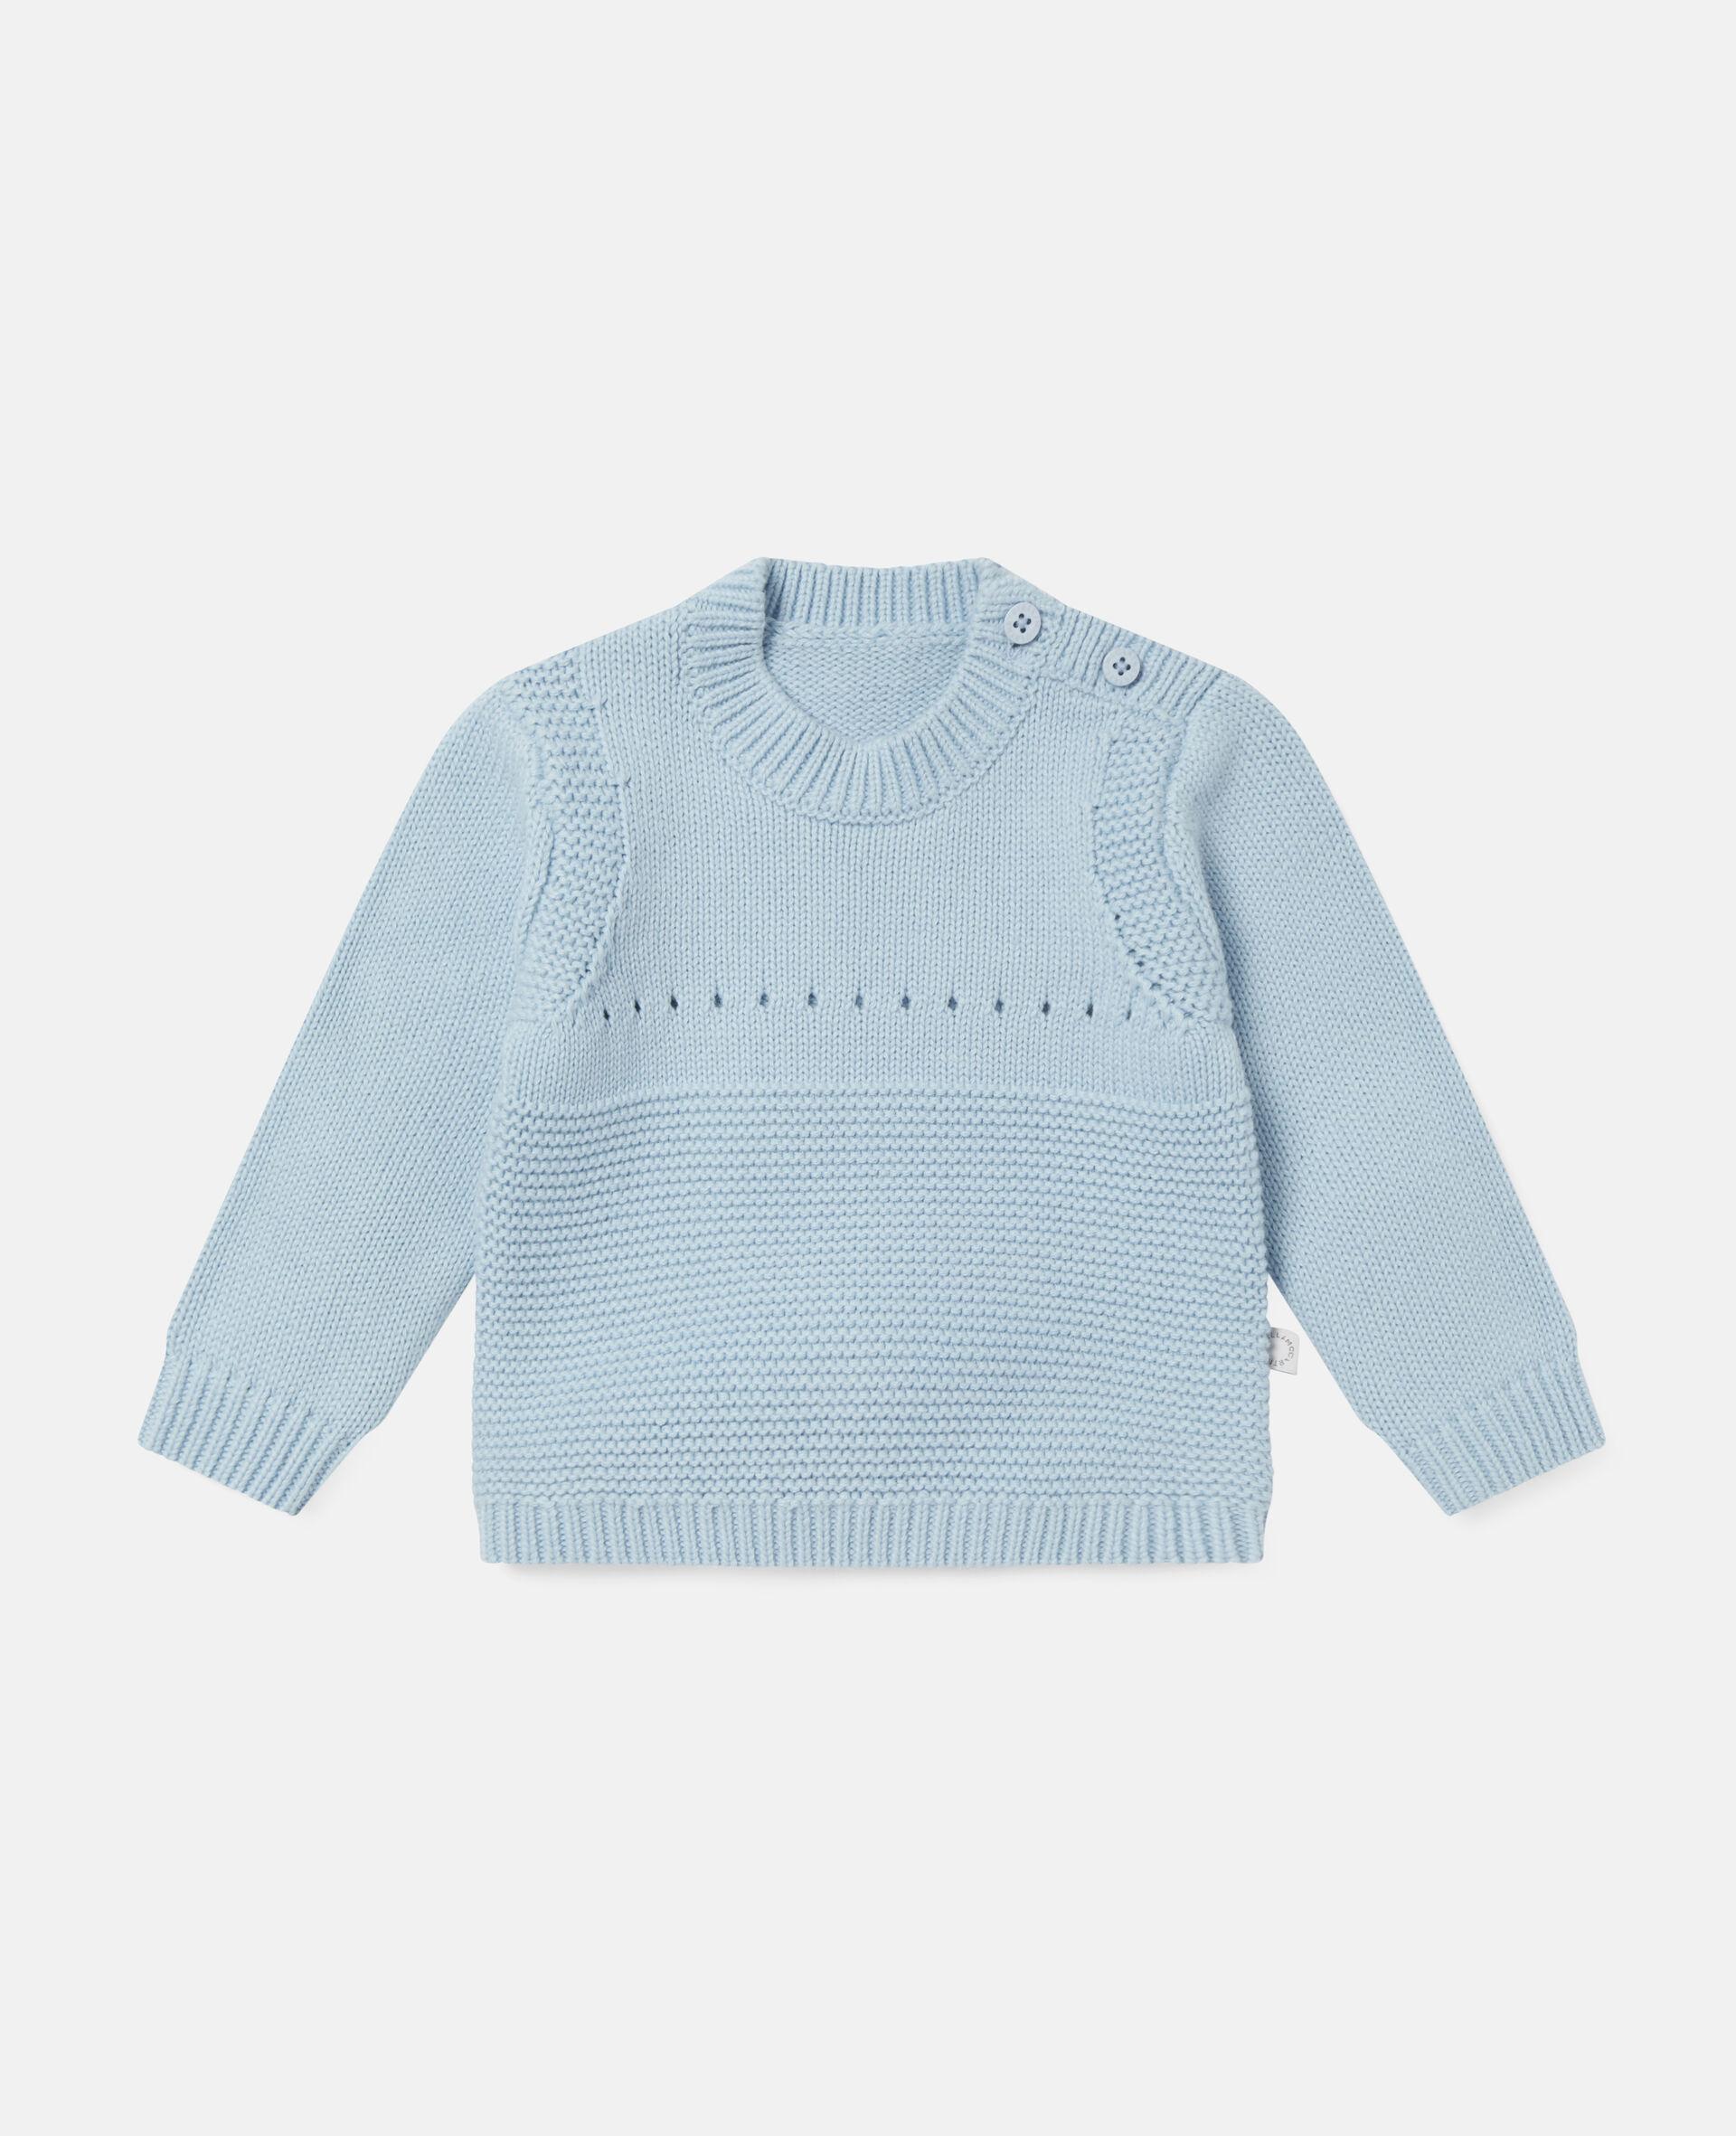 Happy Dog Knit Intarsia Sweater-Blue-large image number 0